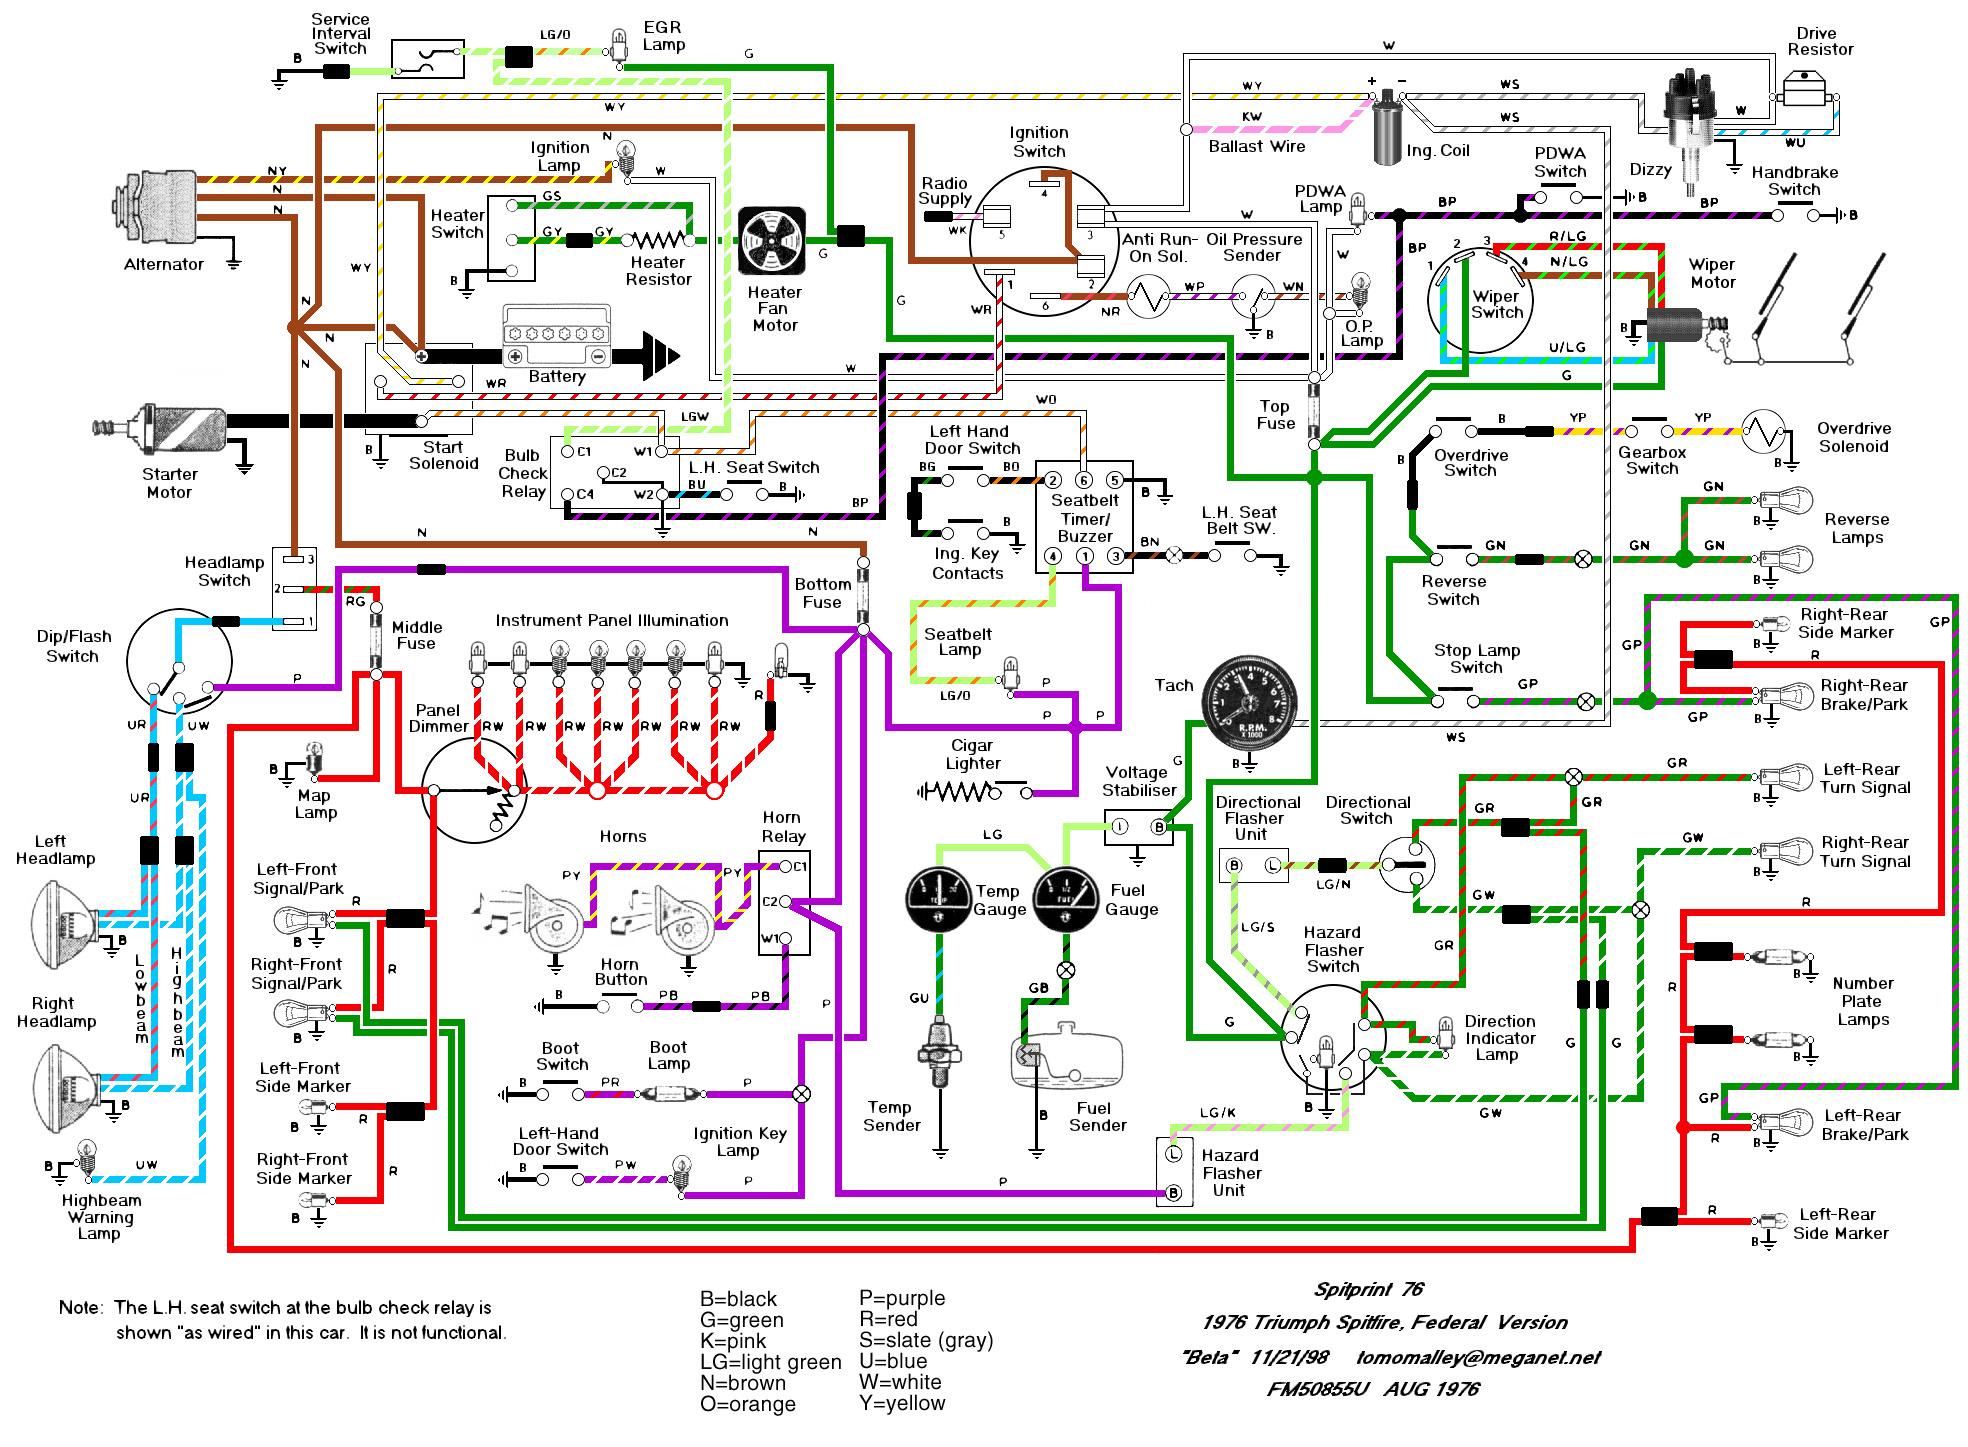 Wiring Schematics And Diagrams - Triumph Spitfire, Gt6, Herald - Wiring Diagram For